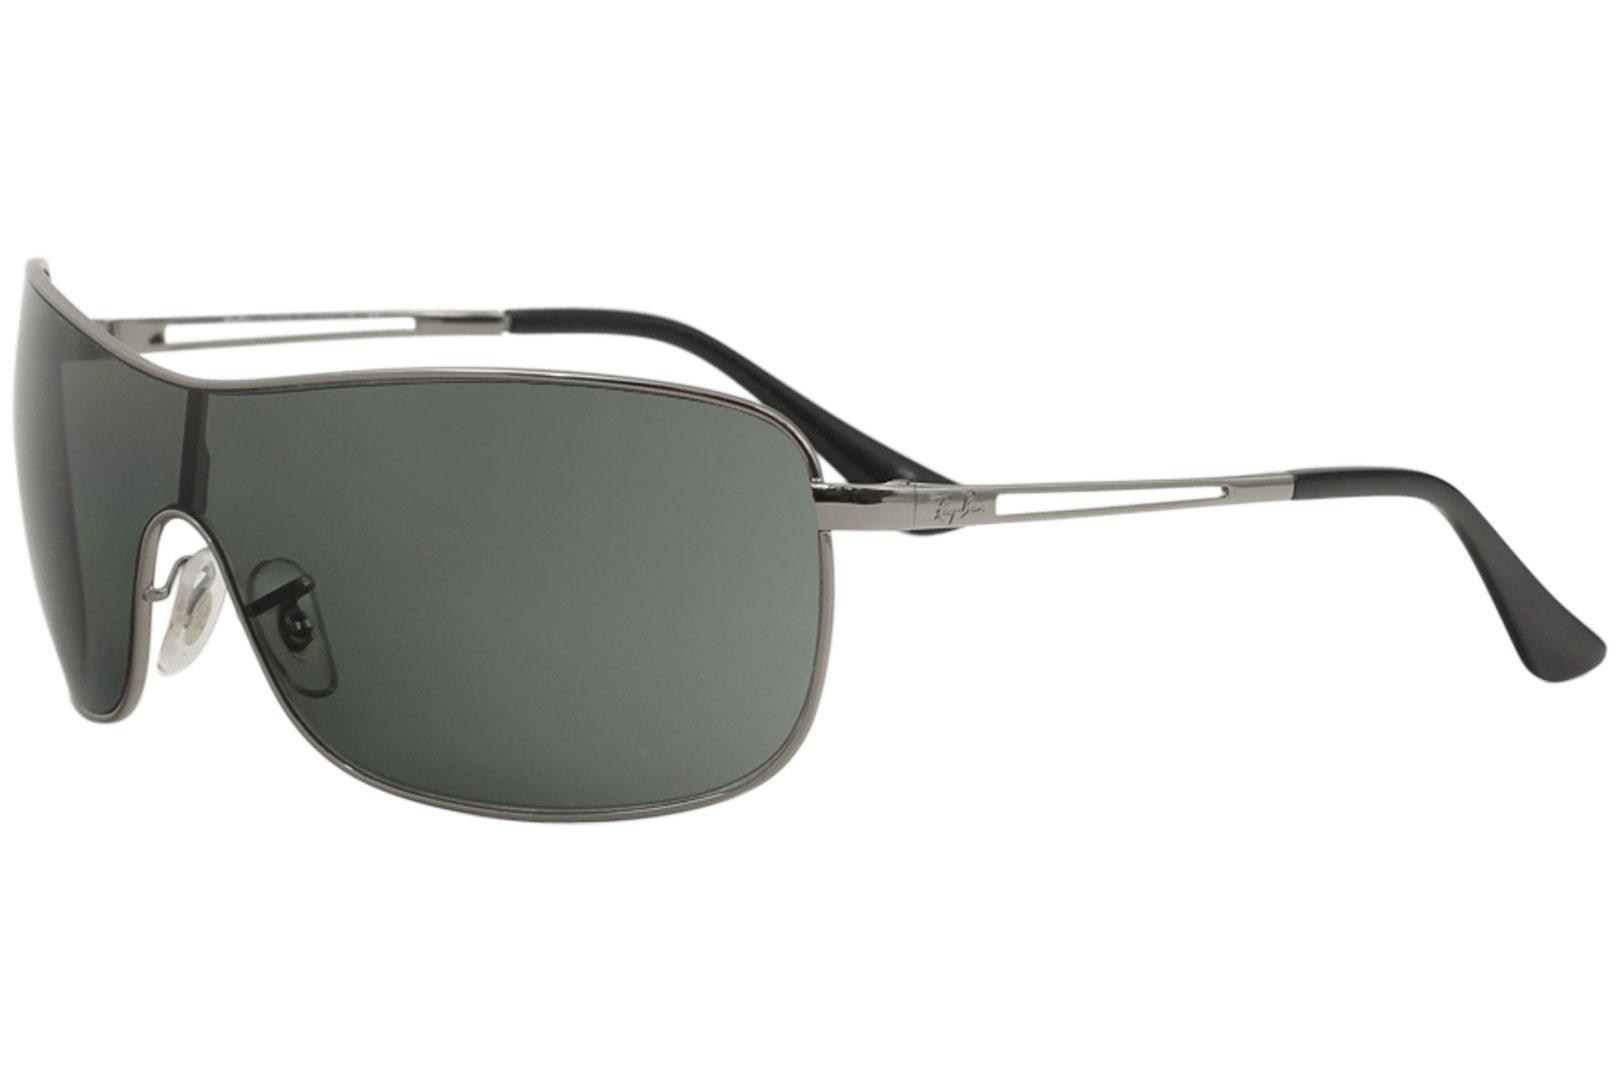 2ff994eec98892 Ray Ban Men s RB3466 RB 3466 RayBan Fashion Shield Sunglasses by Ray Ban